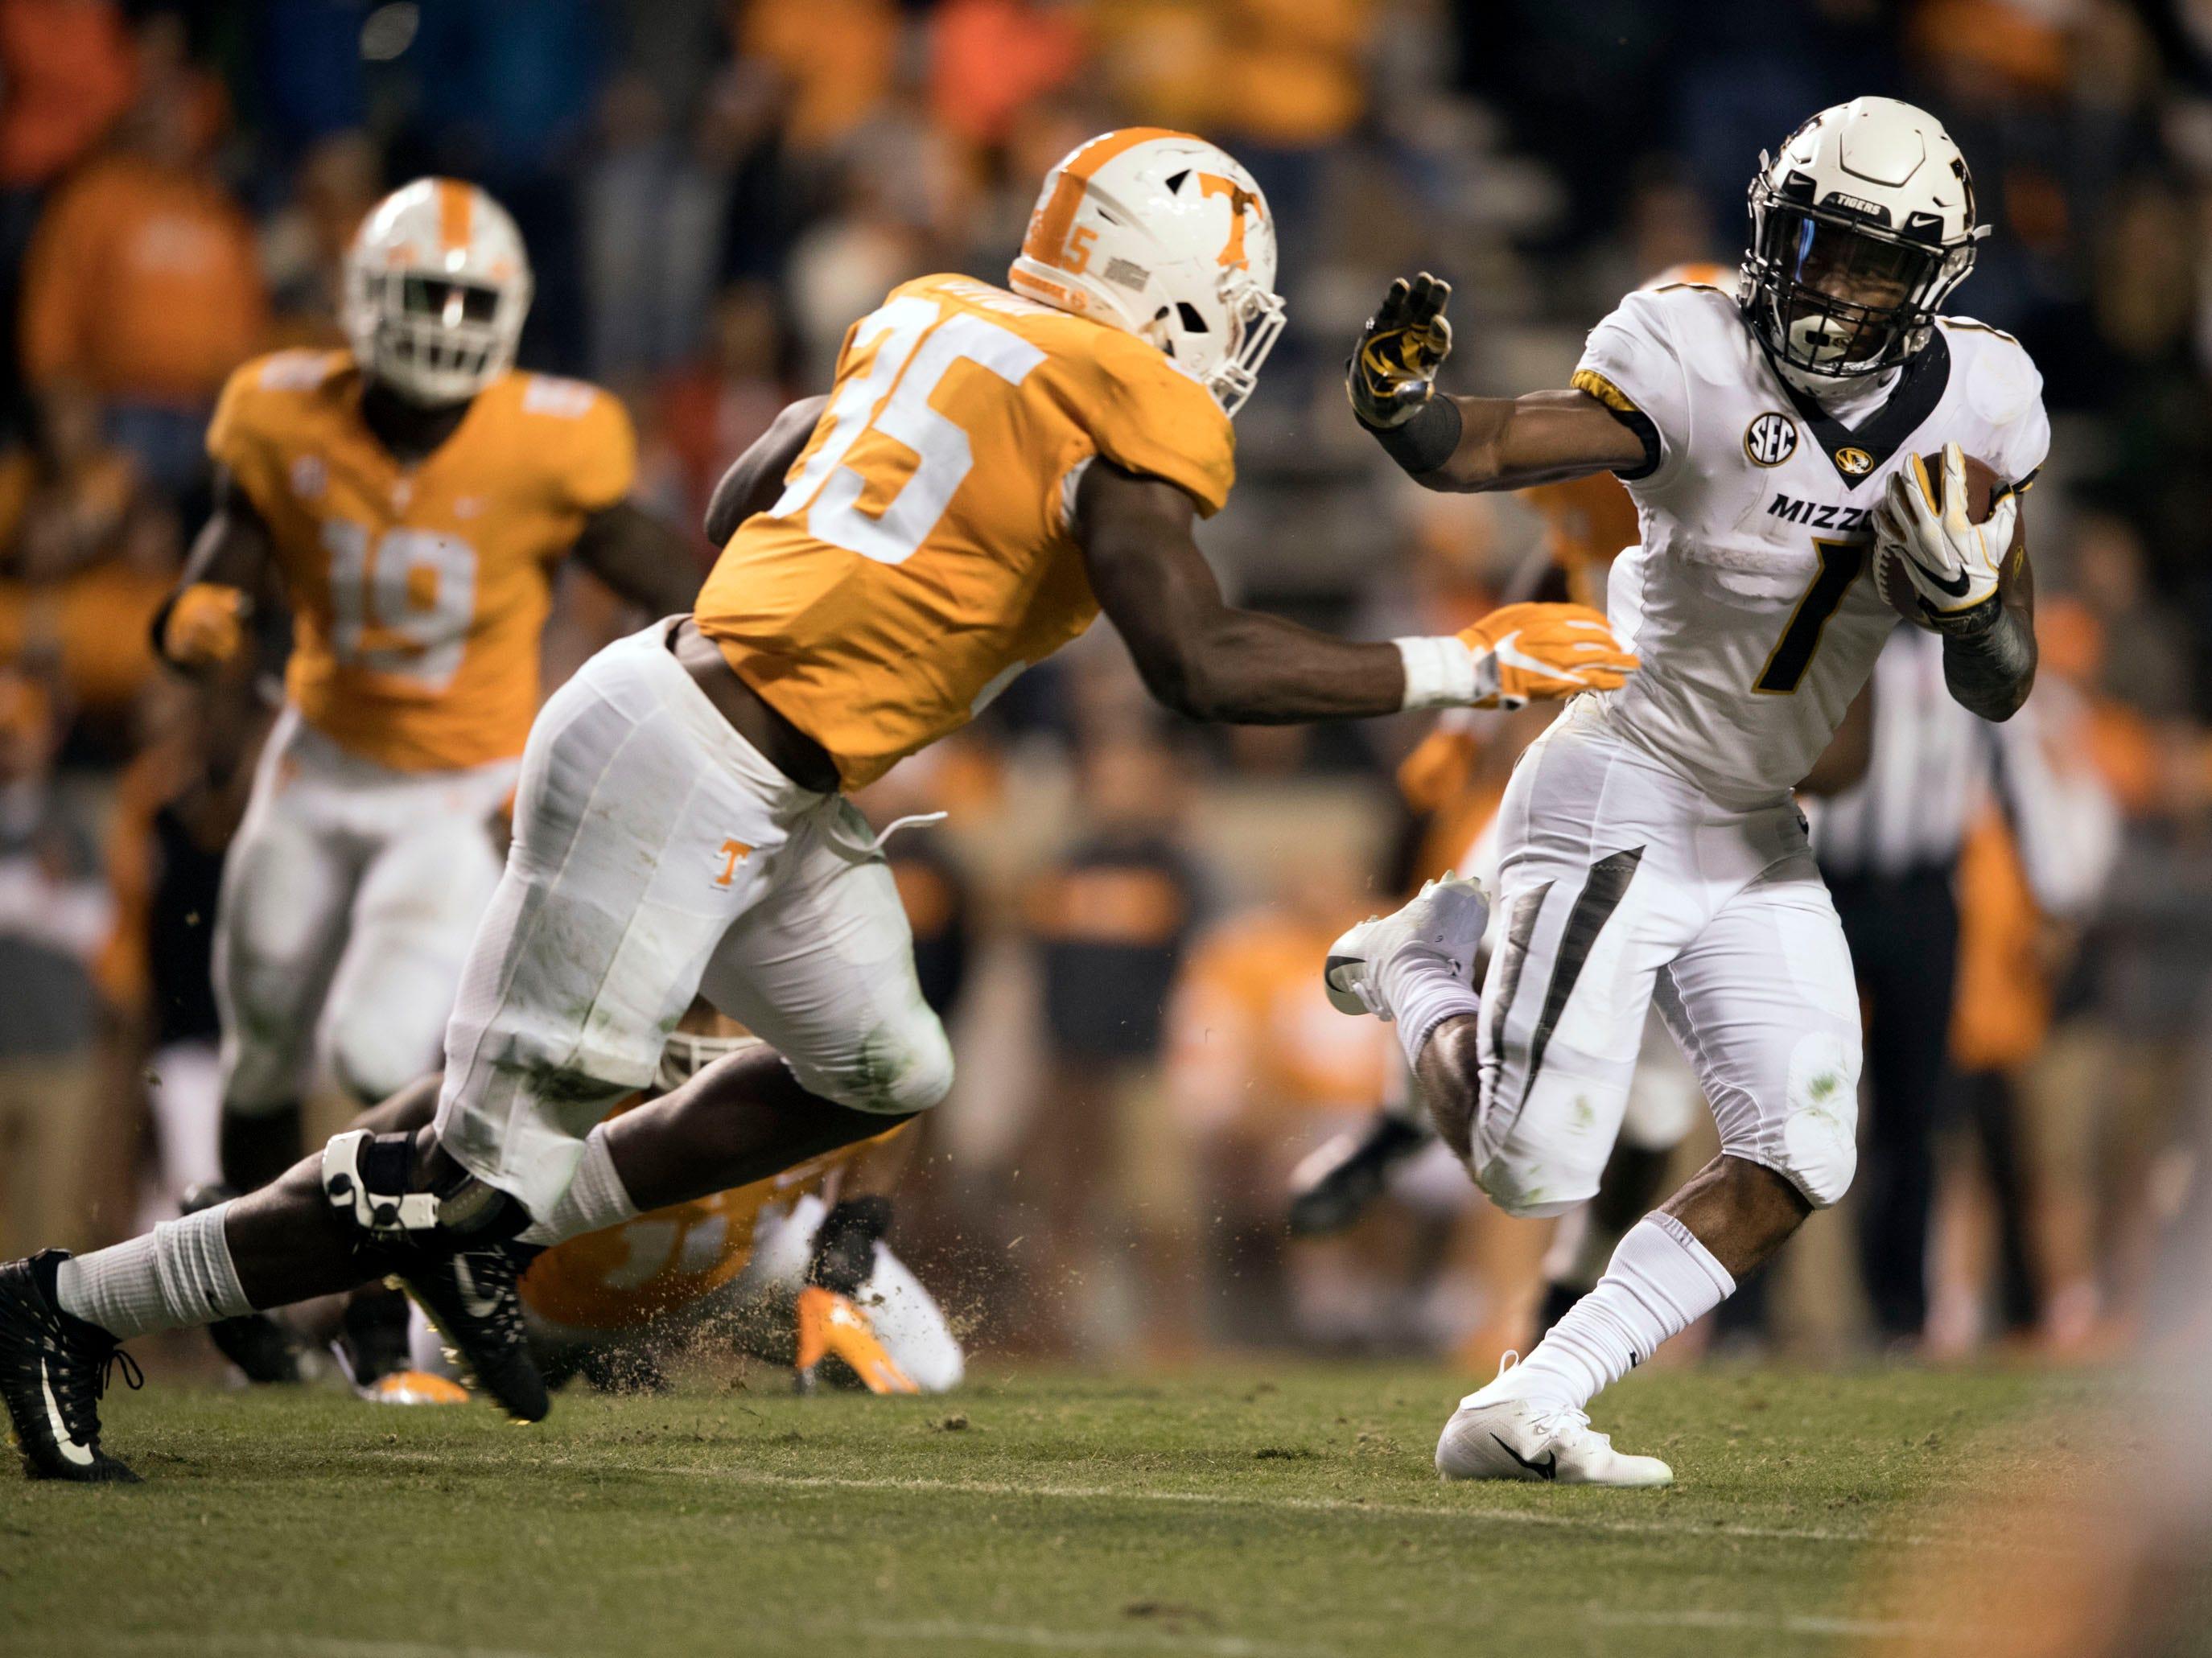 UT Vols vs Vanderbilt football: 5 things to know for ...